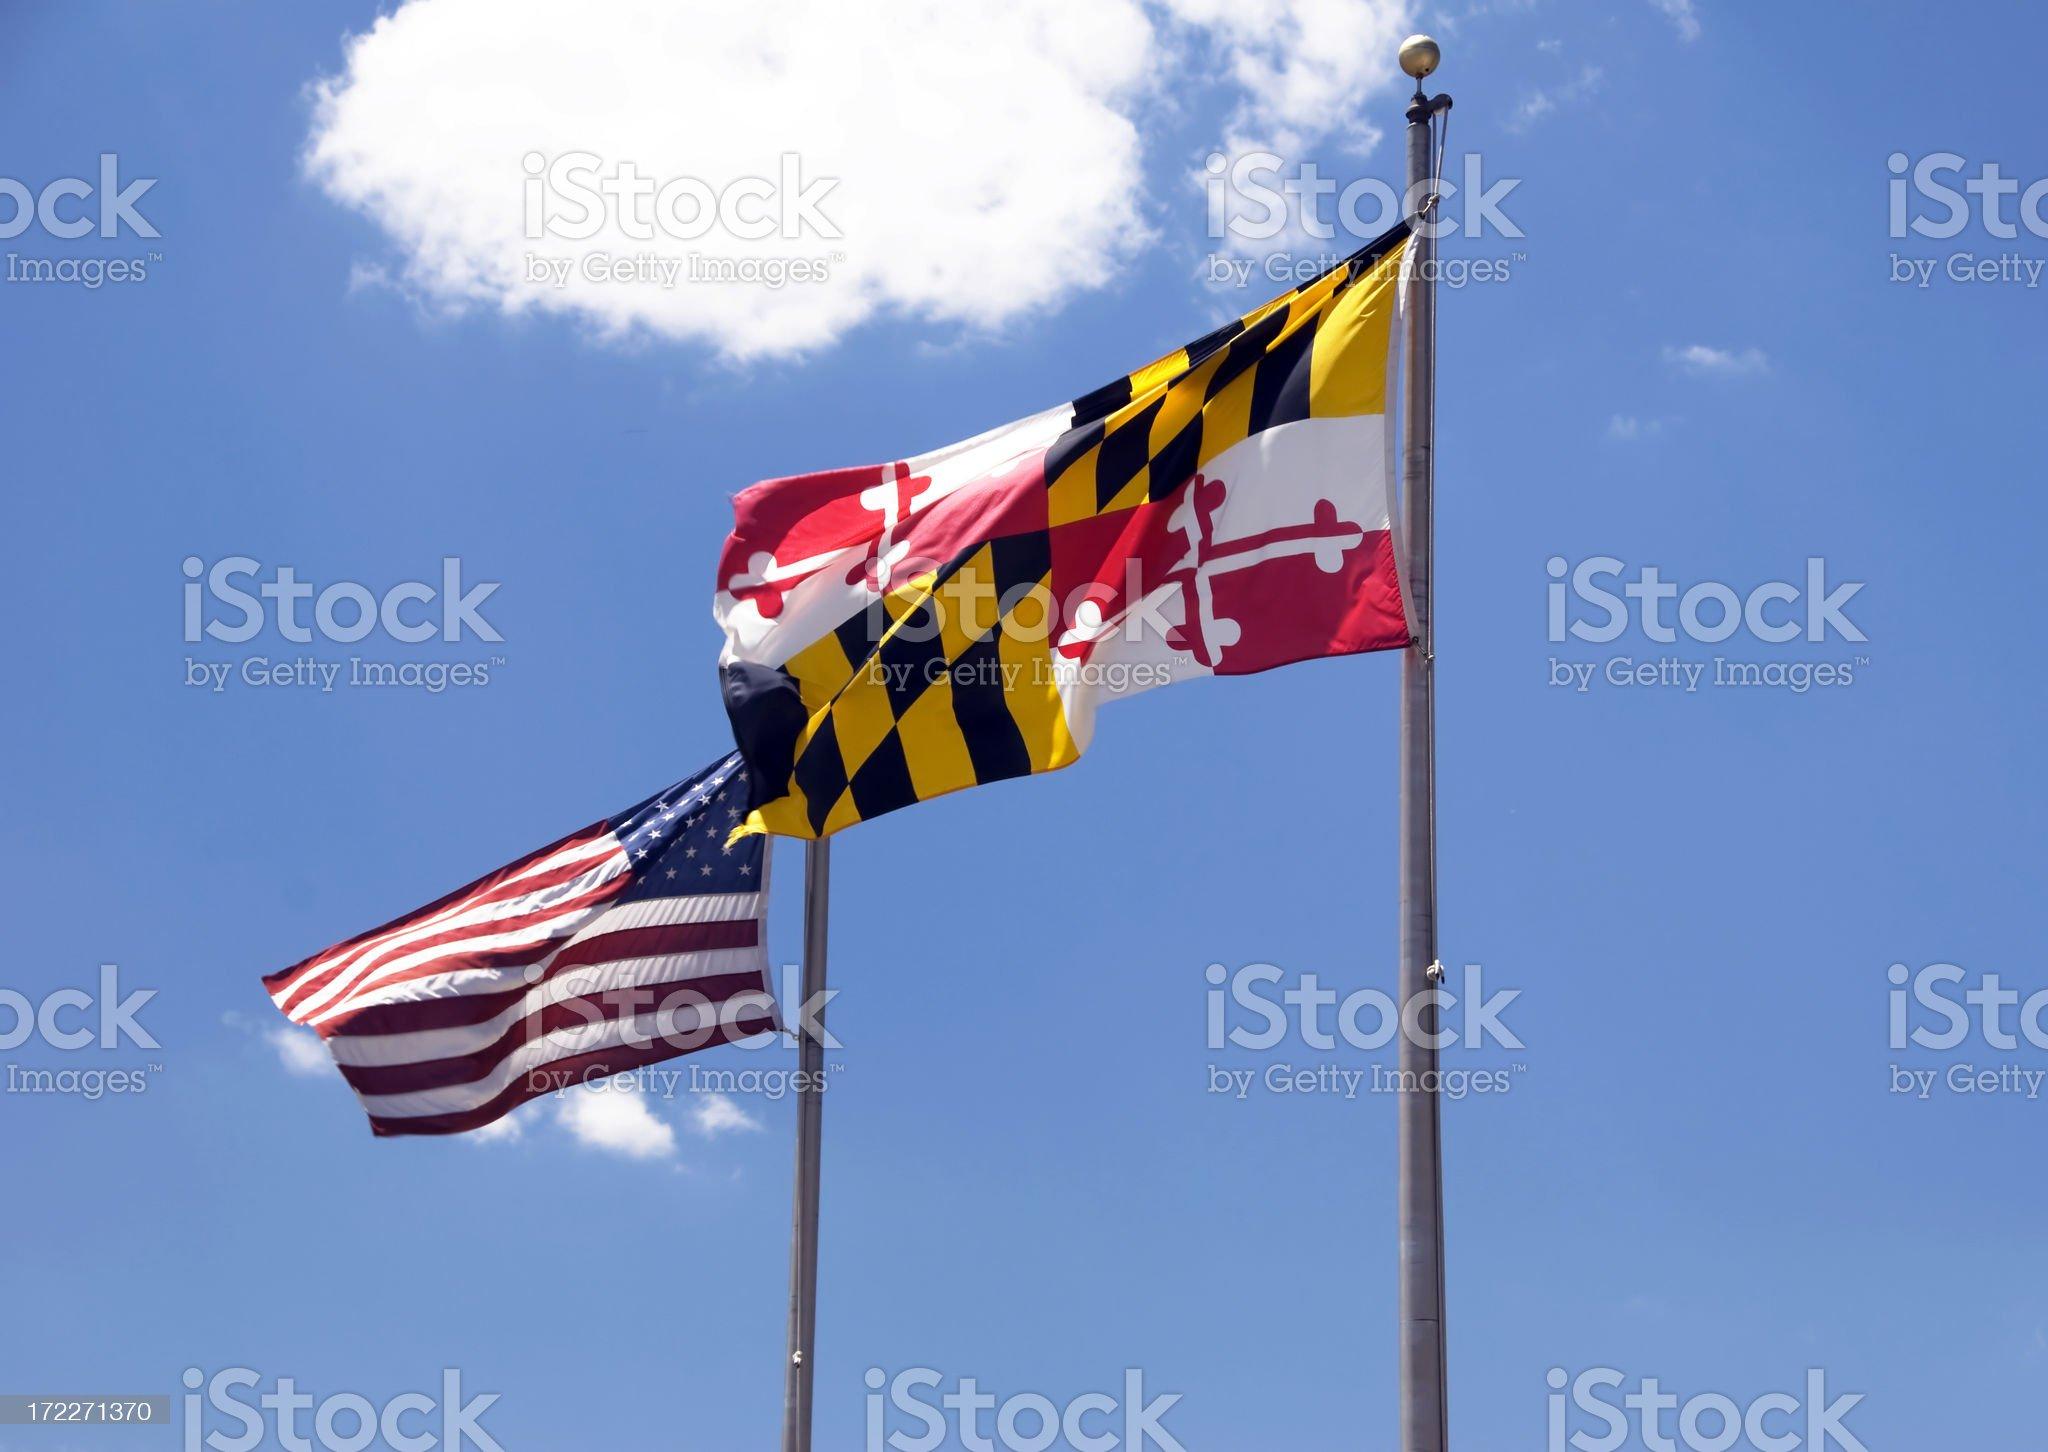 Maryland, USA Flags royalty-free stock photo